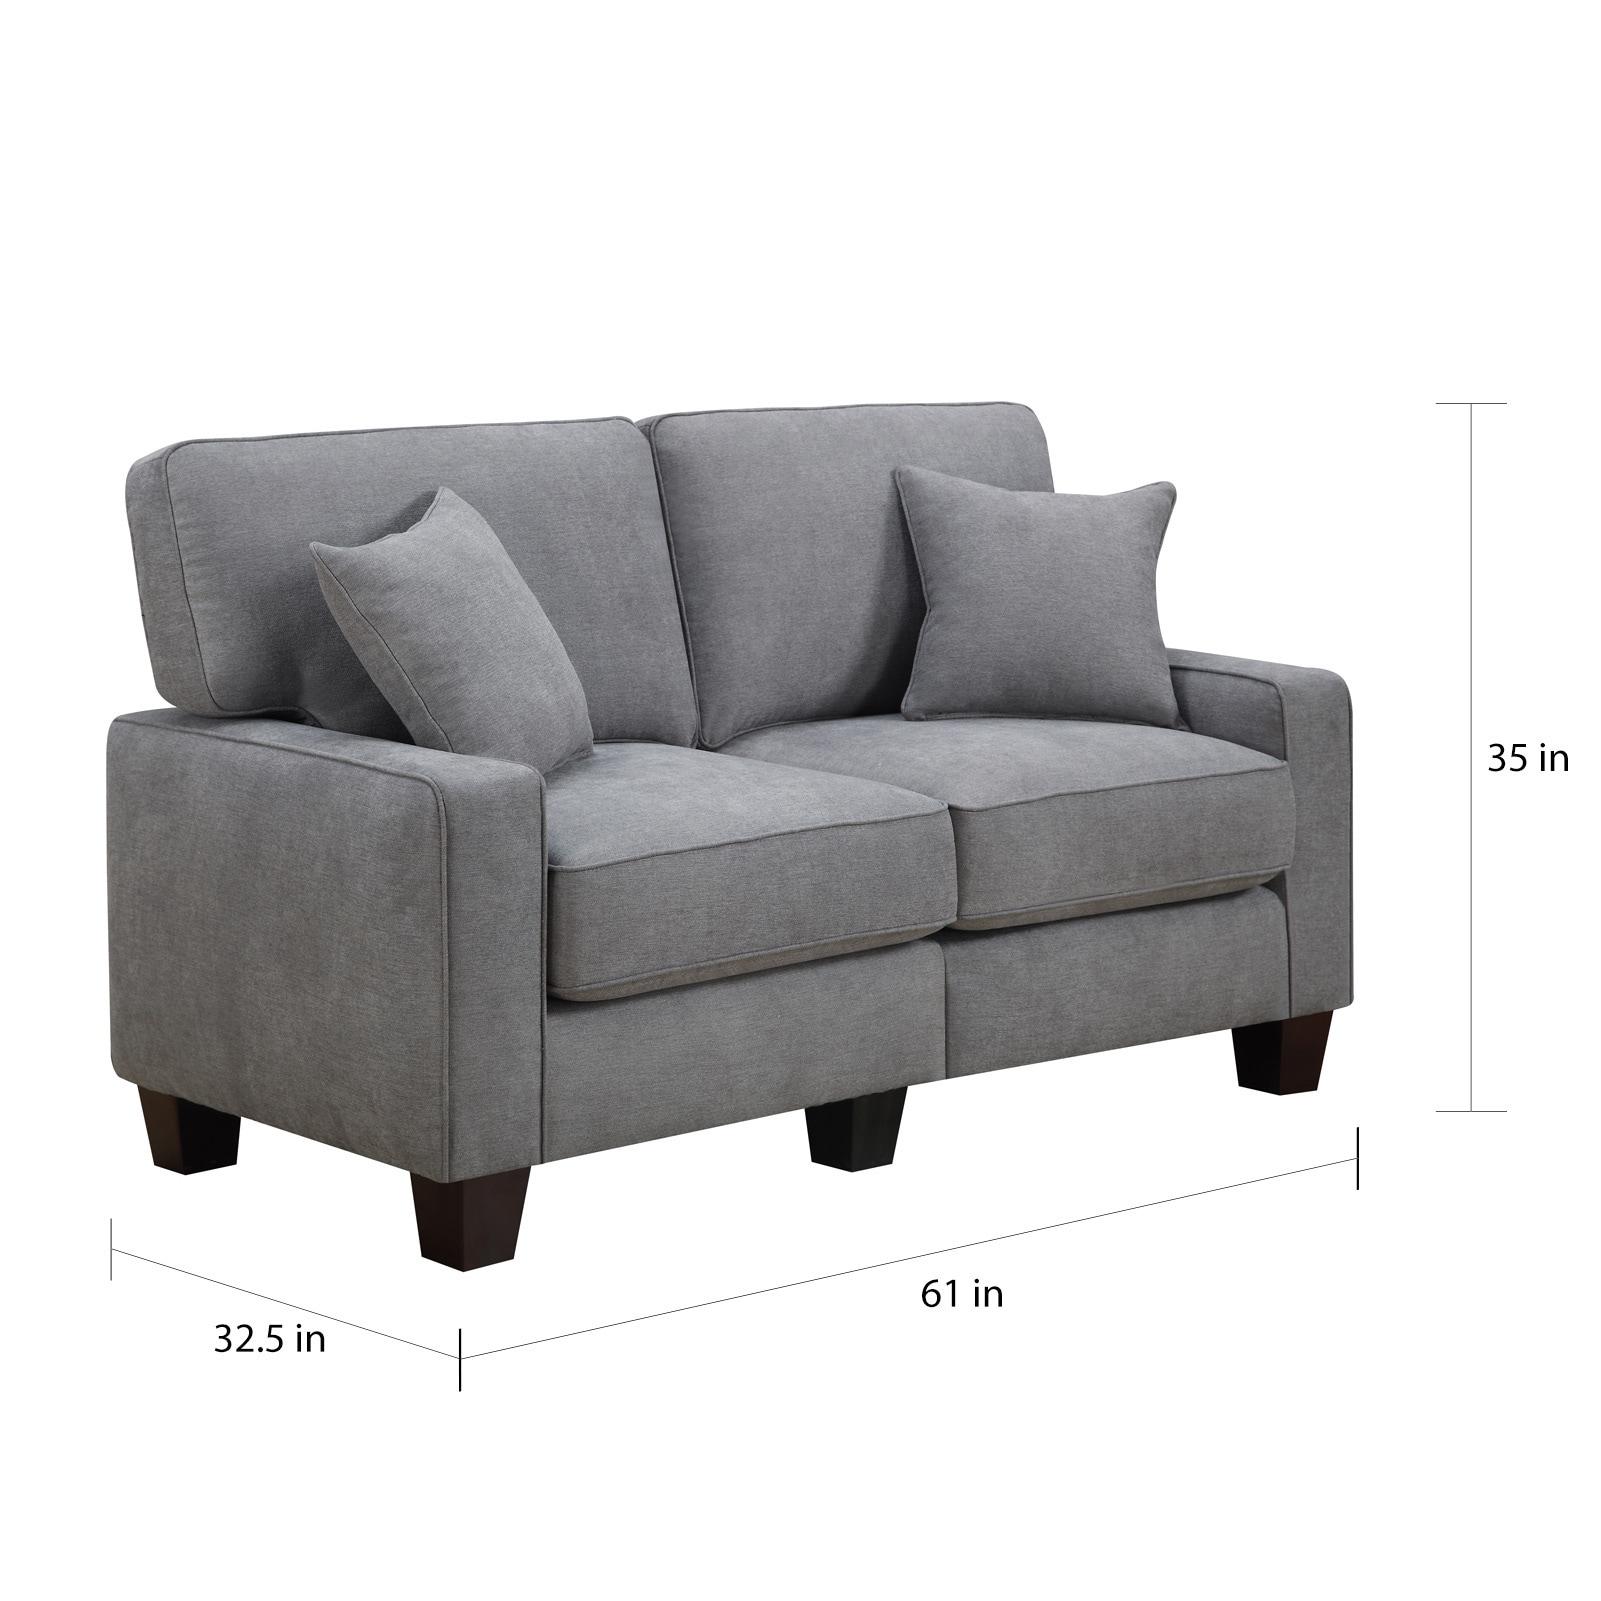 carlton set sofa southern sofaloveseatchairottoman loveseat ottoman enterprises holly raw chair furniture martin alastair